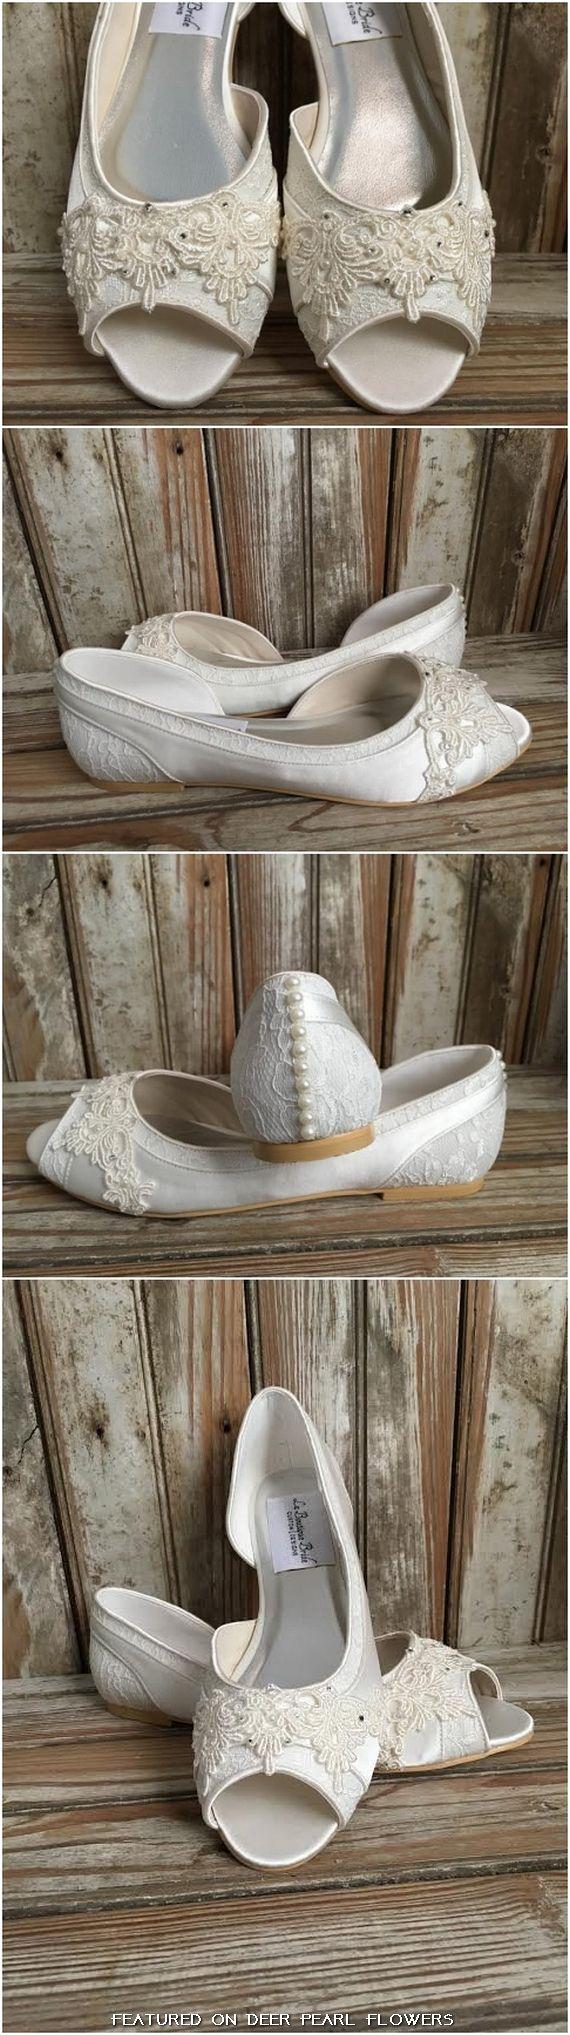 Beaded Lace Flats Peep Toe Wedding Shoe Pearls Crystals / http://www.deerpearlflowers.com/vintage-lace-wedding-shoes/3/